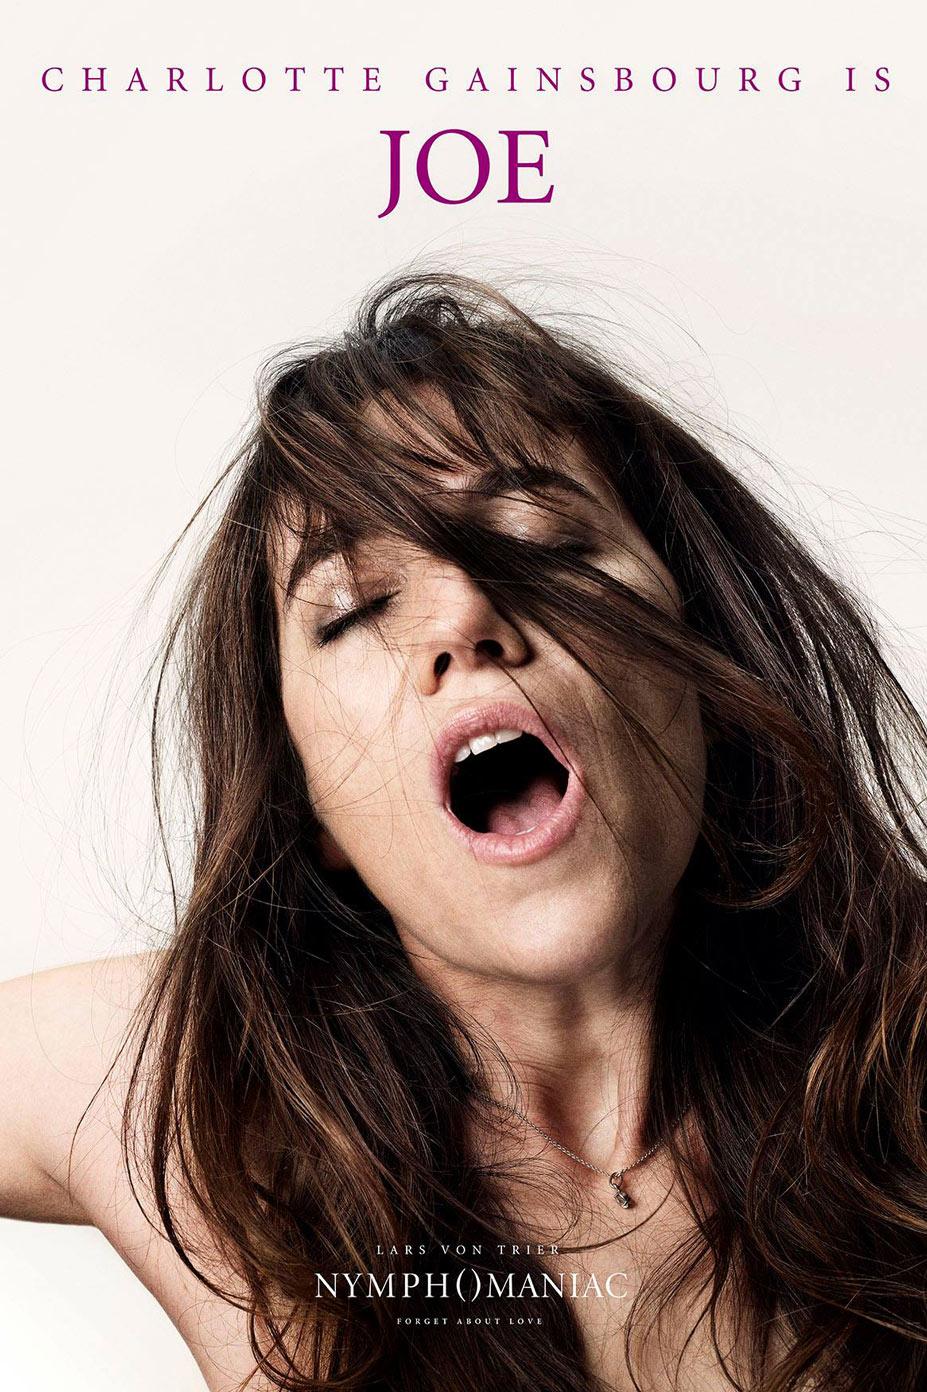 Nymphomaniac - Charlotte Gainsbourg